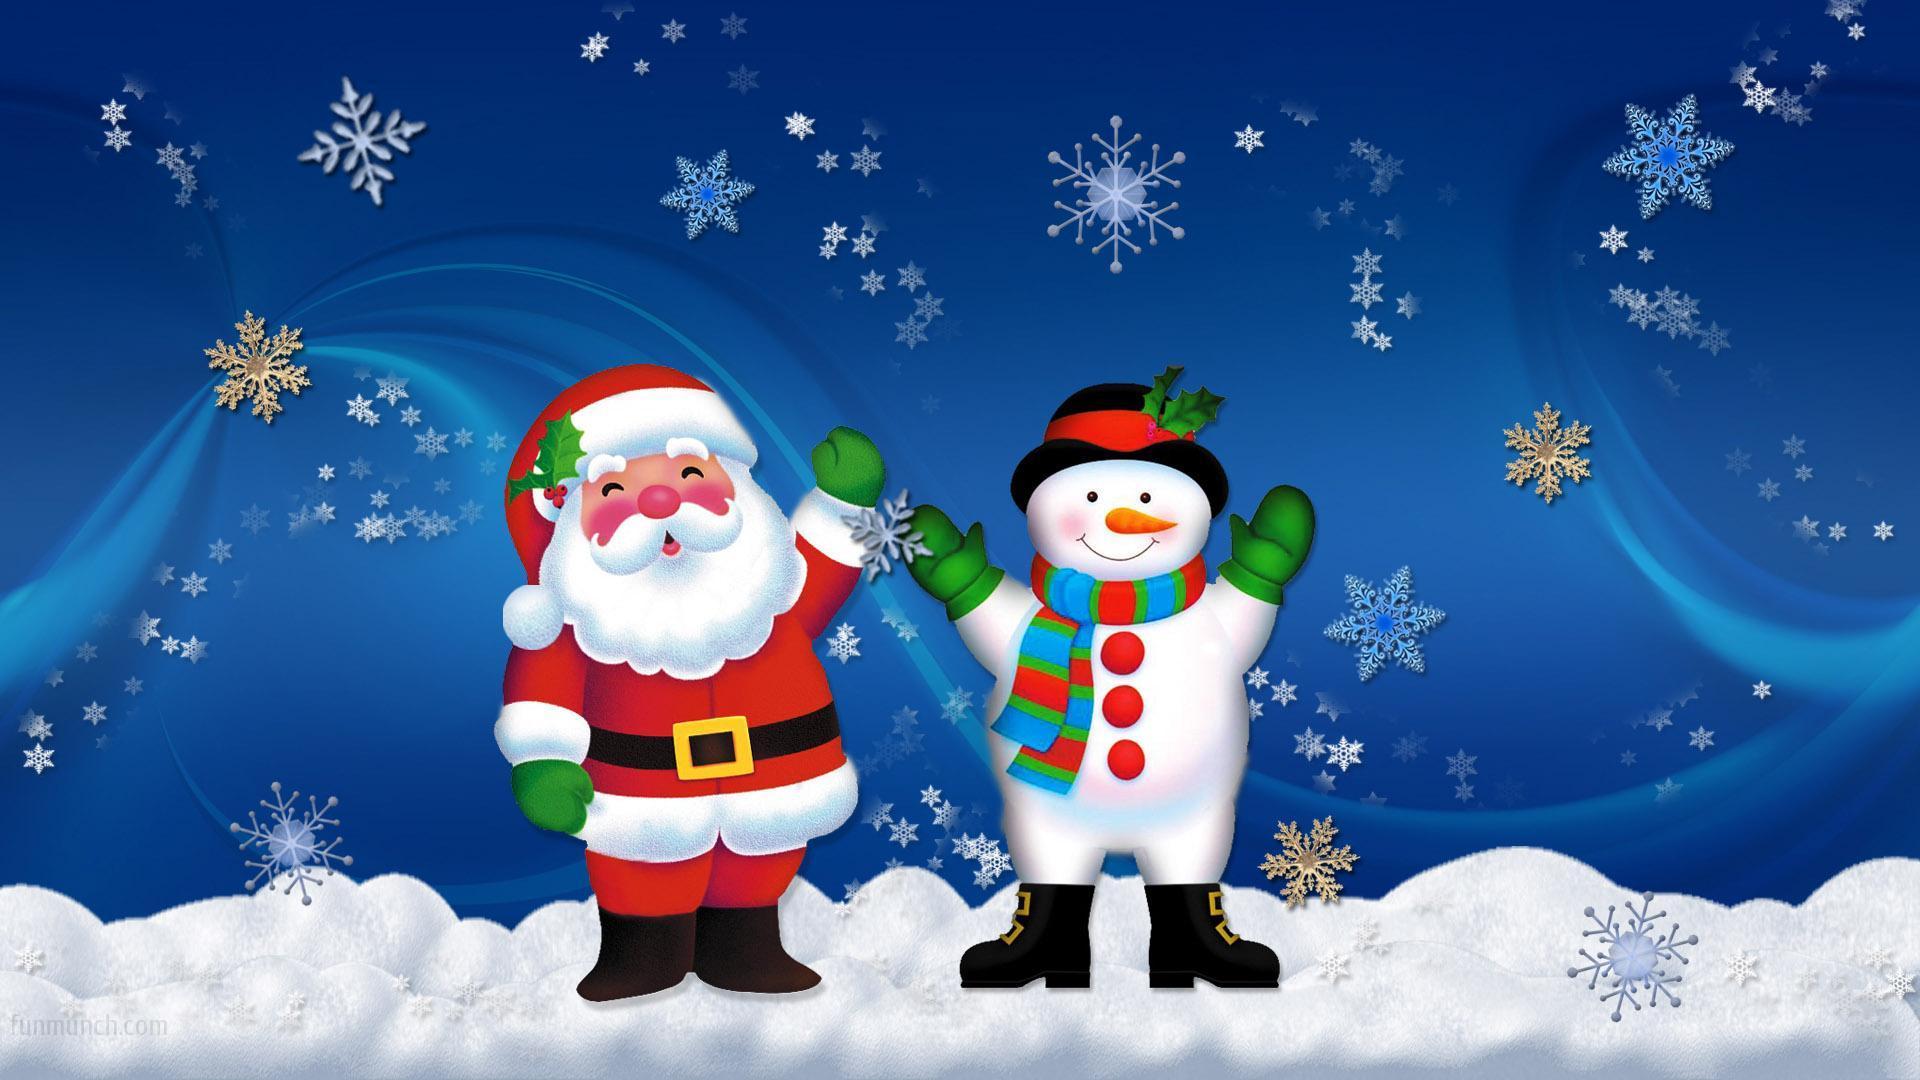 Christmas Desktop Backgrounds wallpaper Animated Christmas Desktop 1920x1080